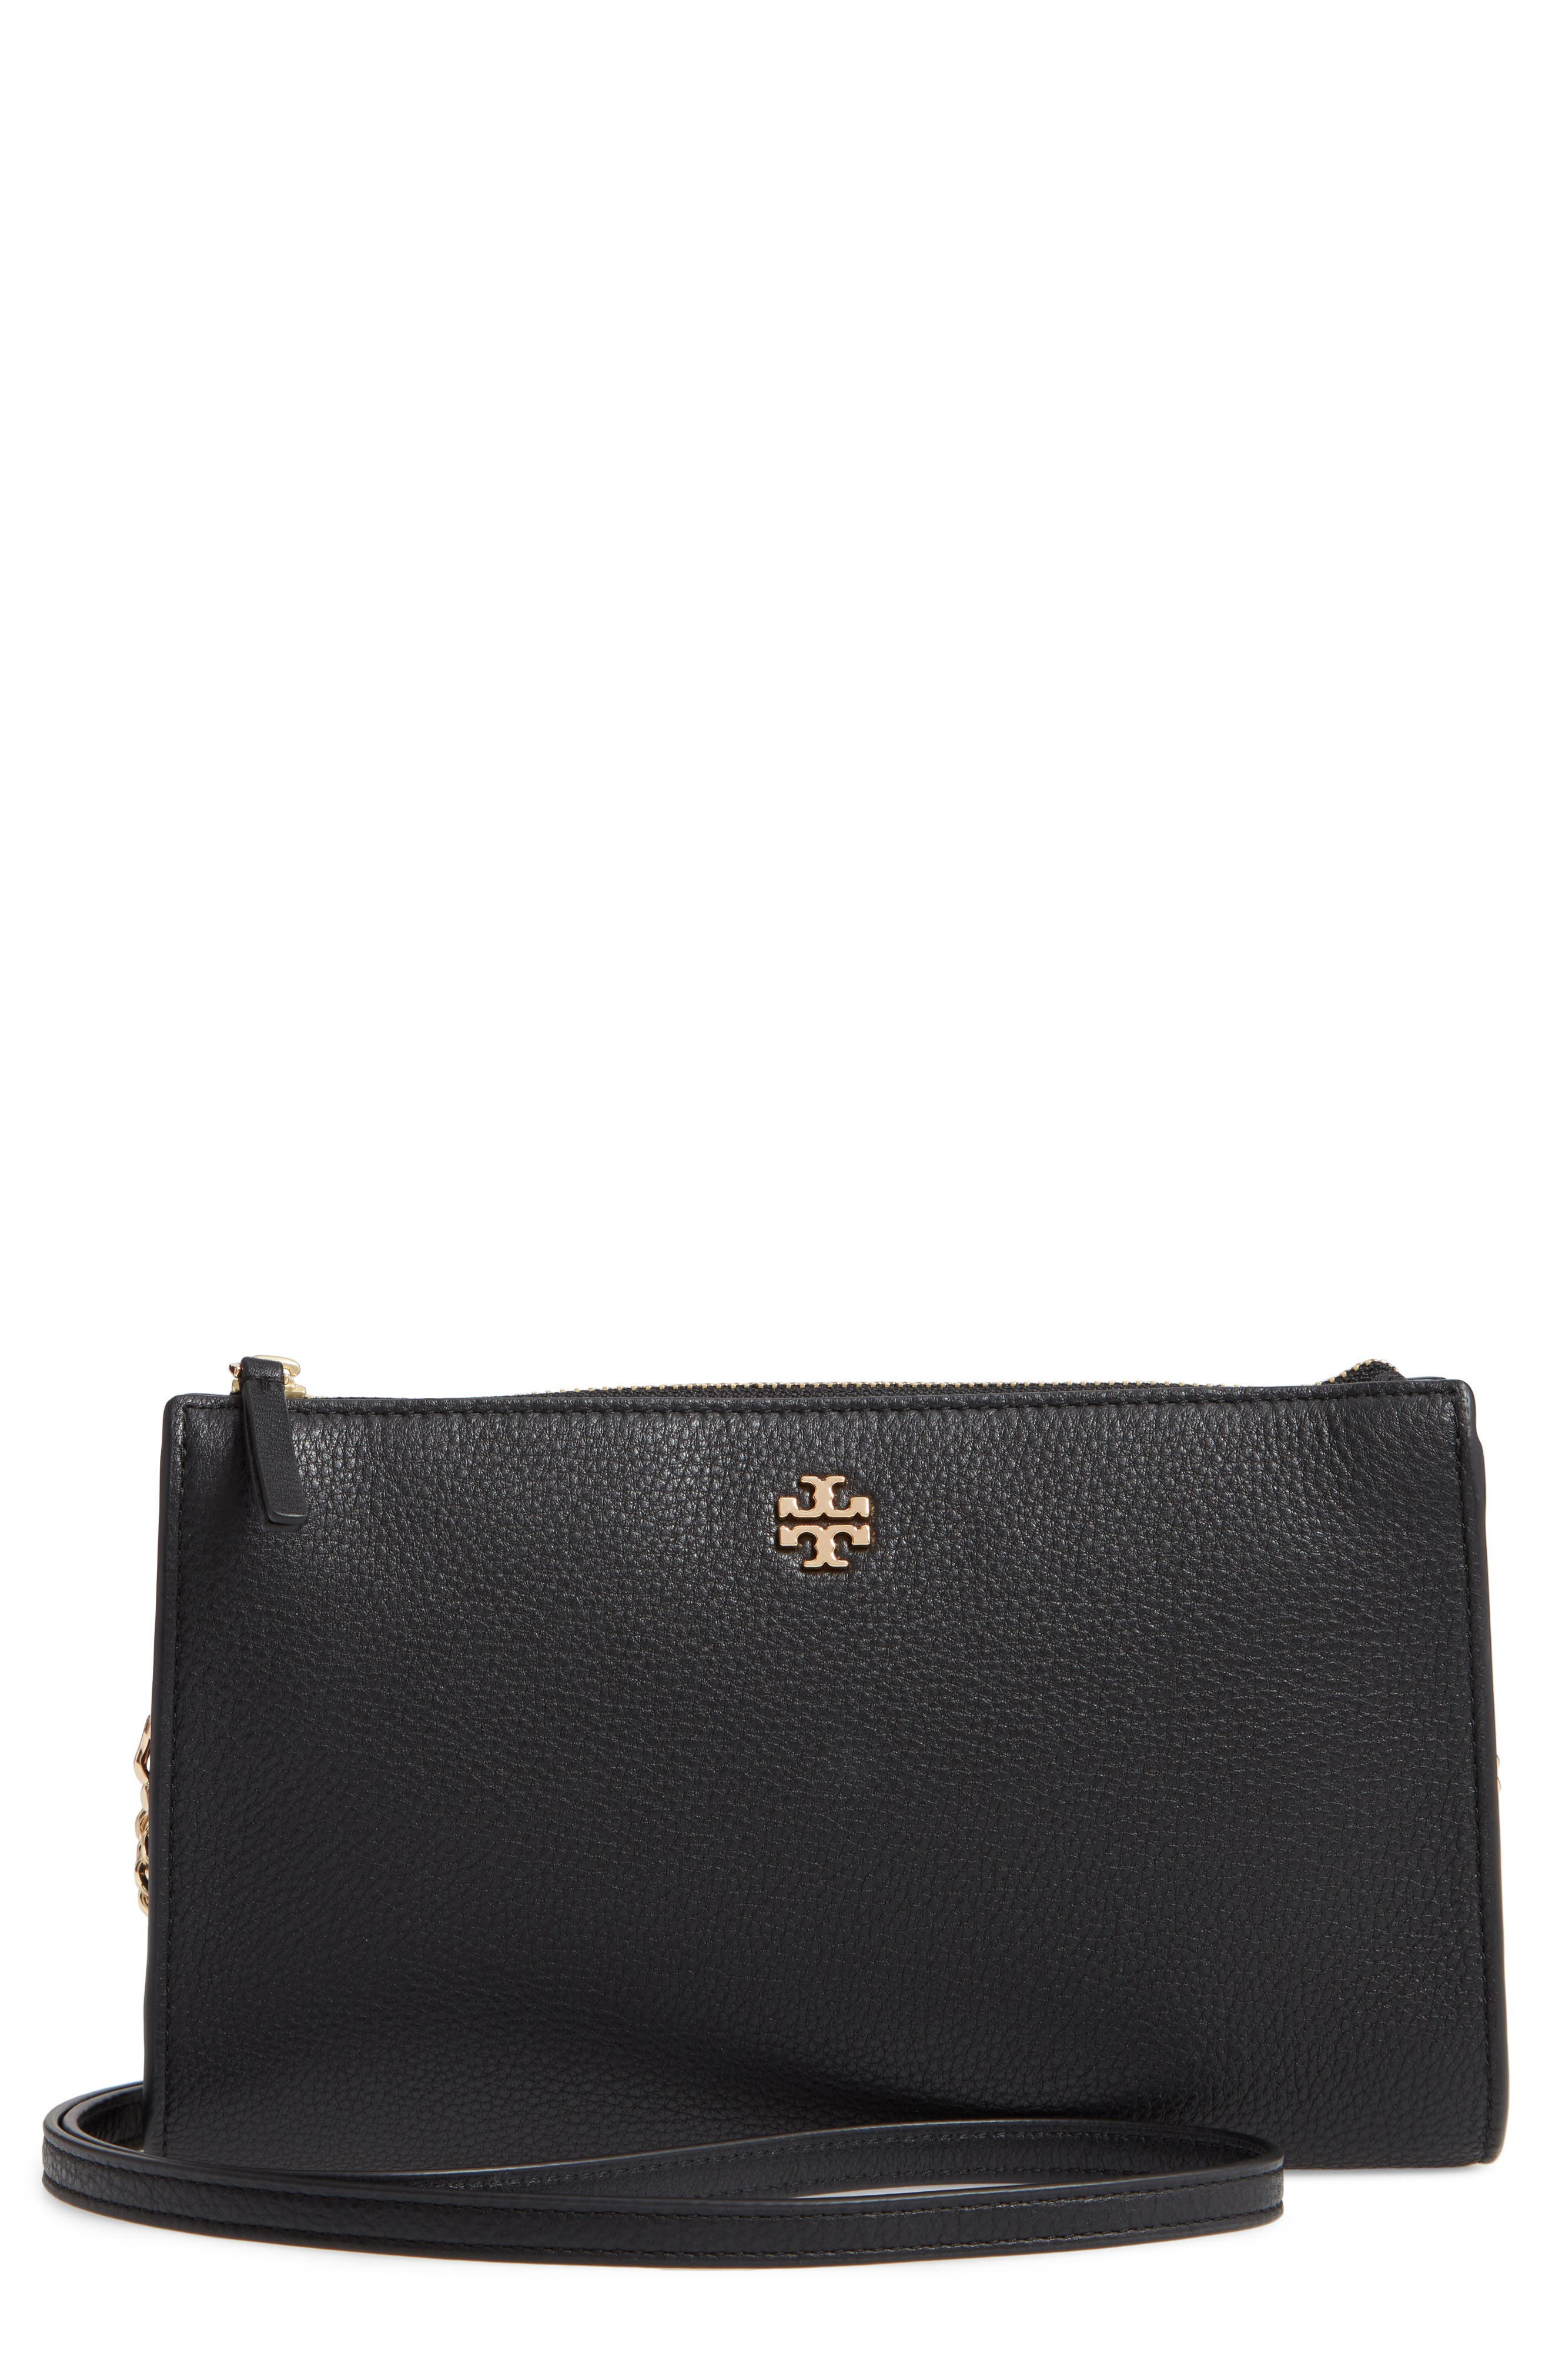 TORY BURCH Pebbled Leather Top Zip Crossbody Bag, Main, color, BLACK